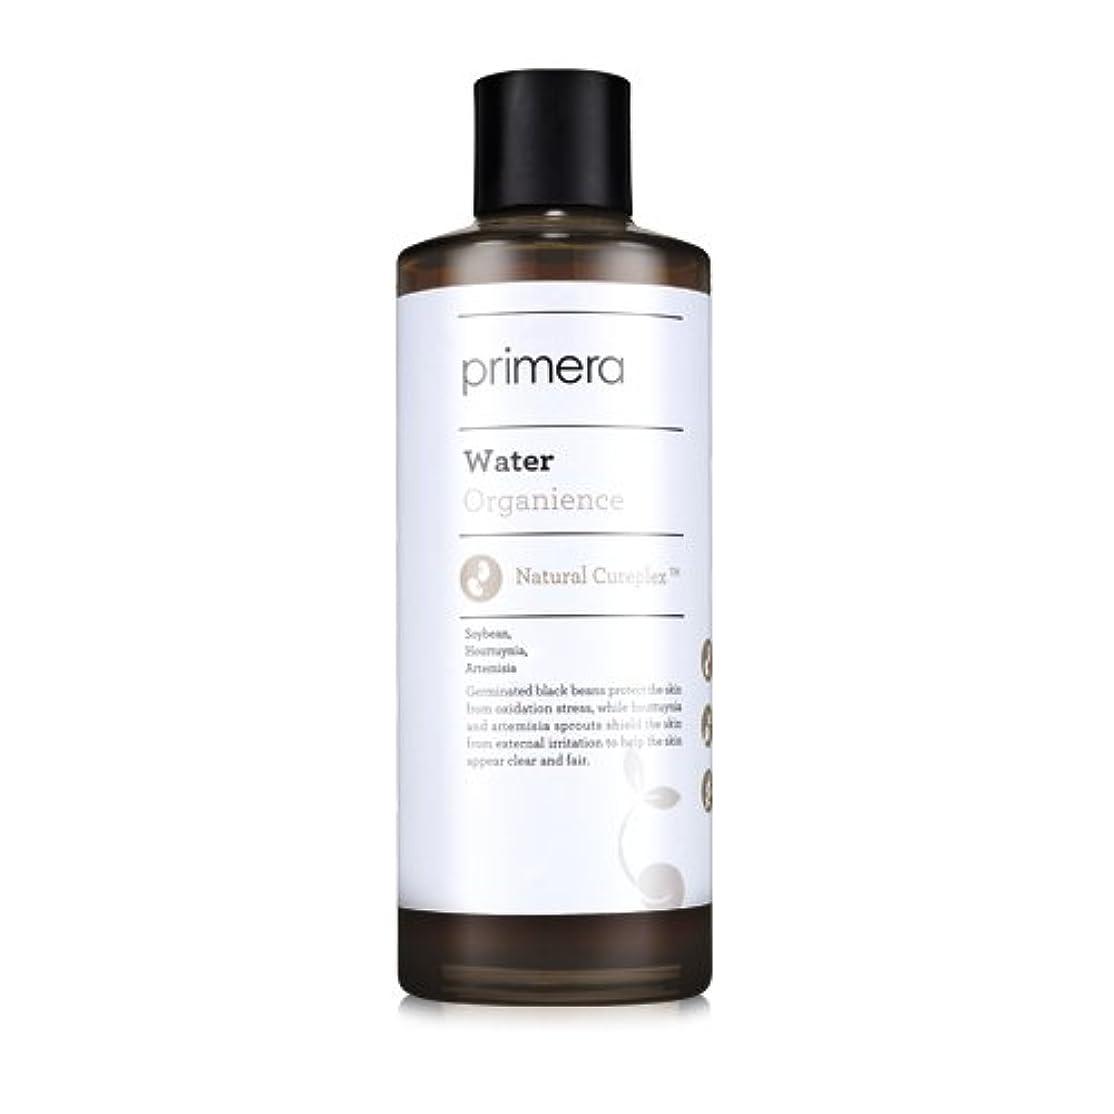 PRIMERA プリメラ オーガニエンス エマルジョン(Organience Emulsion)乳液 150ml